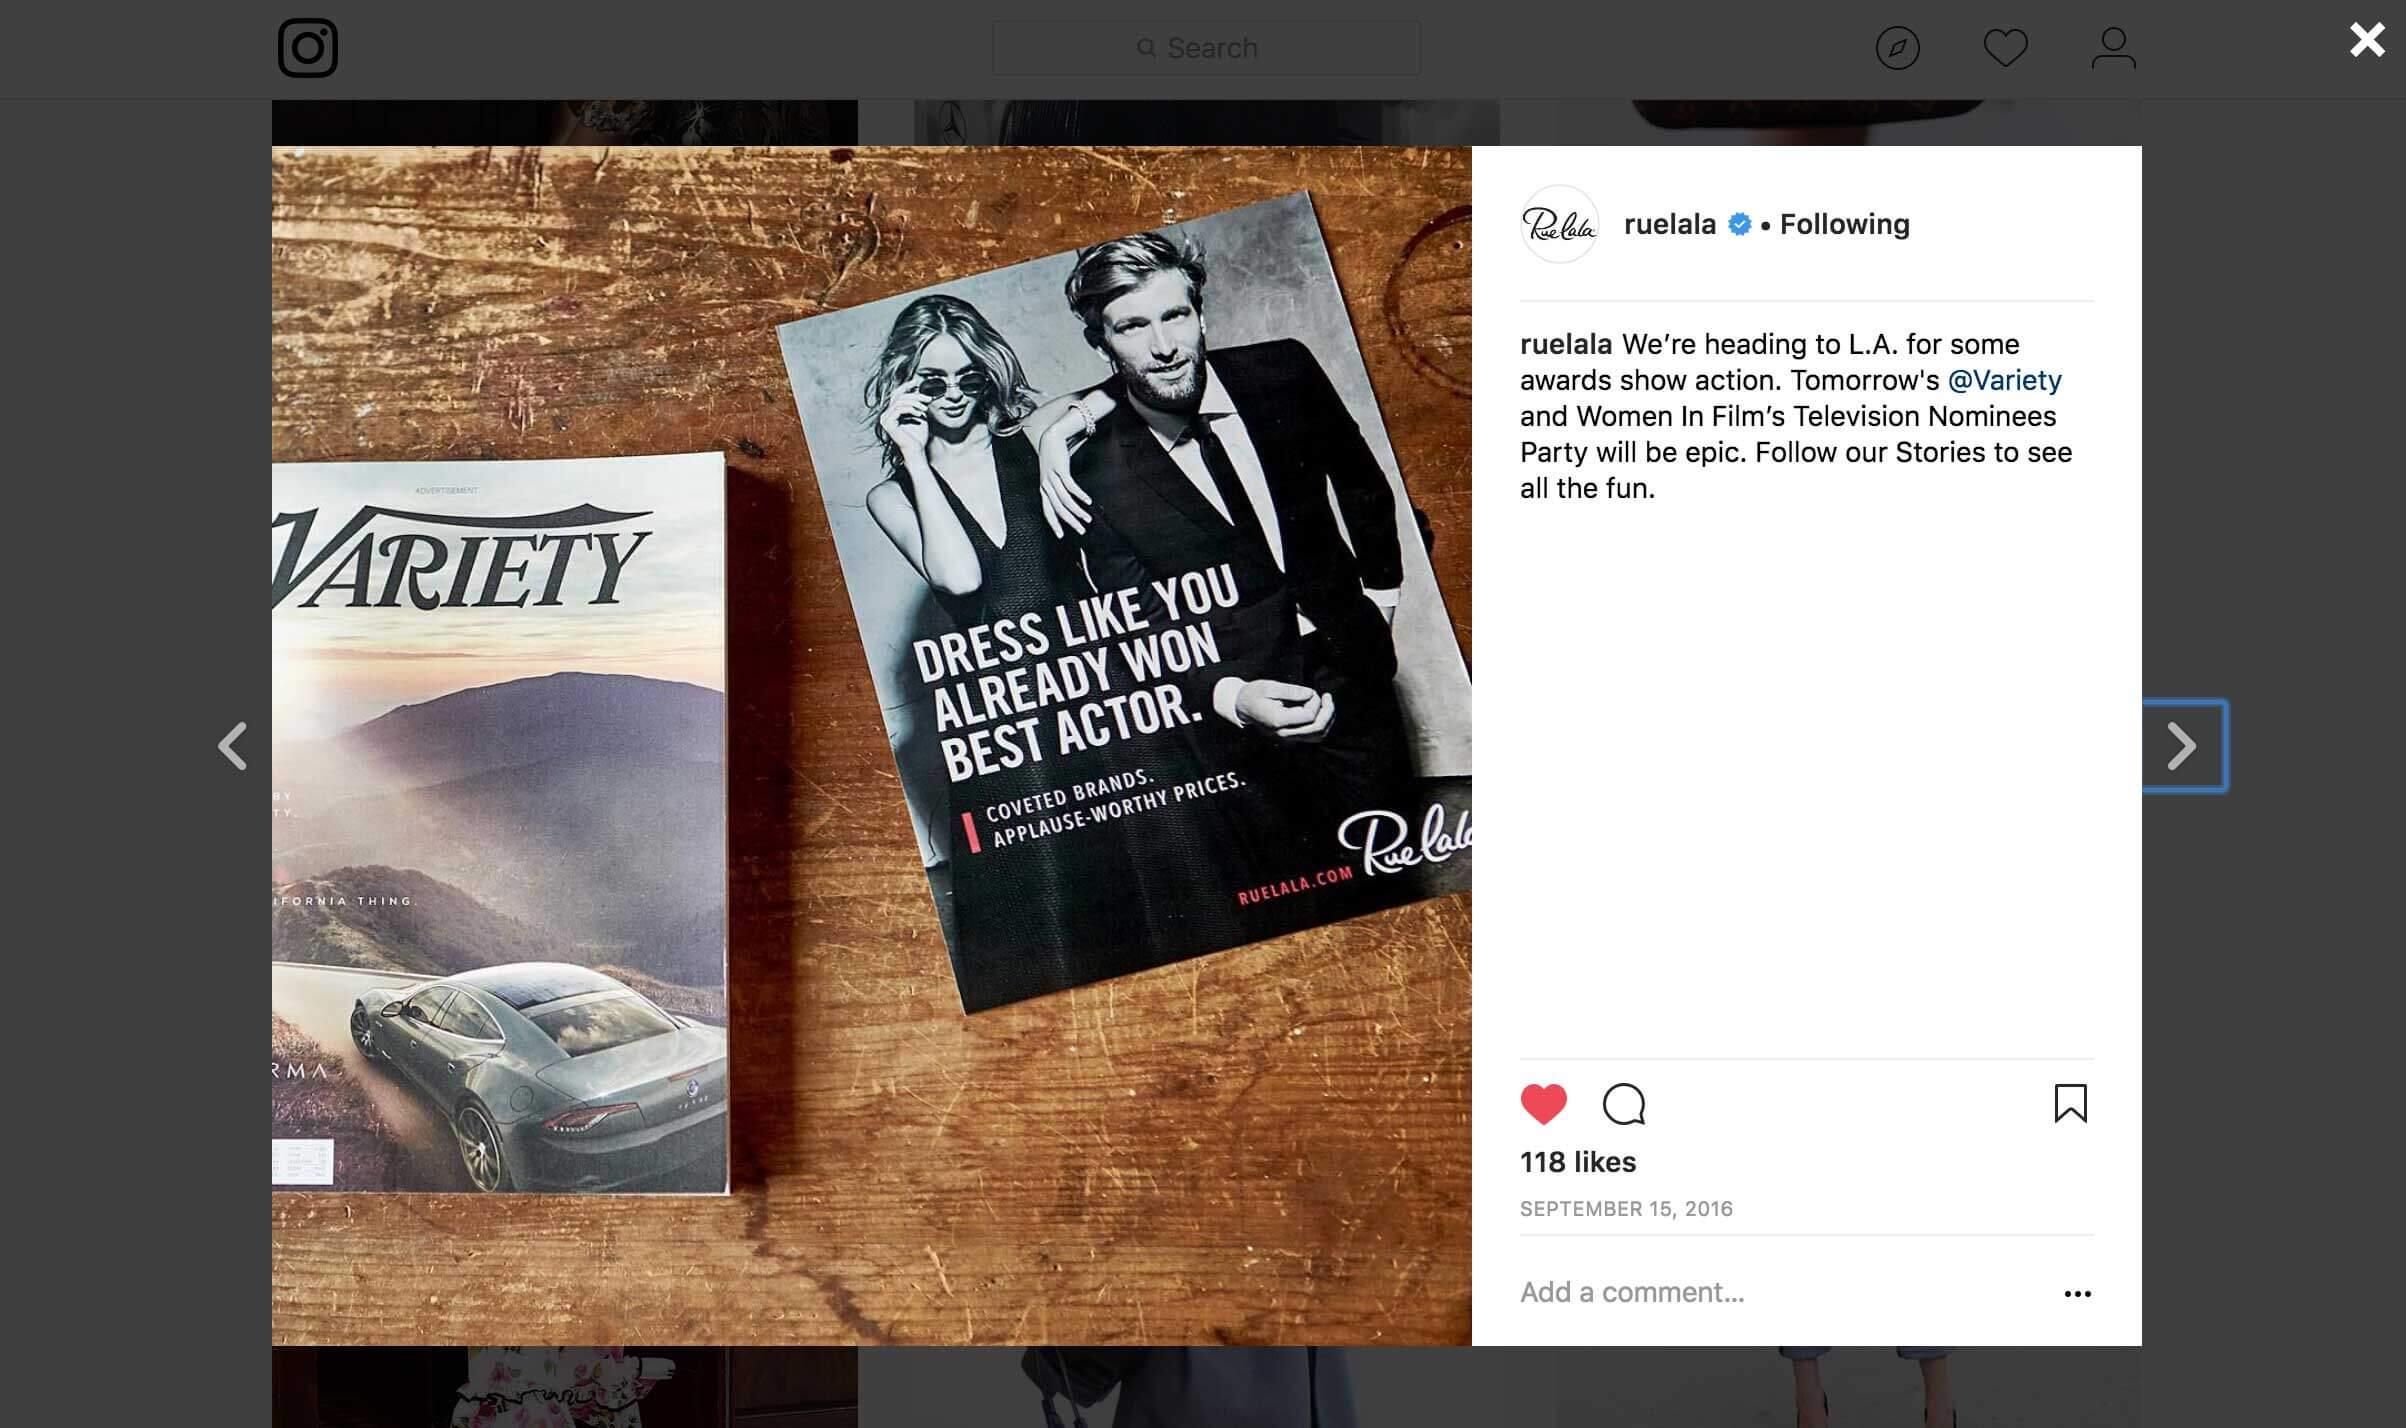 ruelala-variety-instagram-magazine-print-cover-graphic-design-type-typeography-collab-collaboration-lvg-lvgdesigns-laura-vanessa-gonzalez-ad-advertisement-Ana--Jonynas-Tobias-Lewis-tim-bitici-model-models-4.jpg